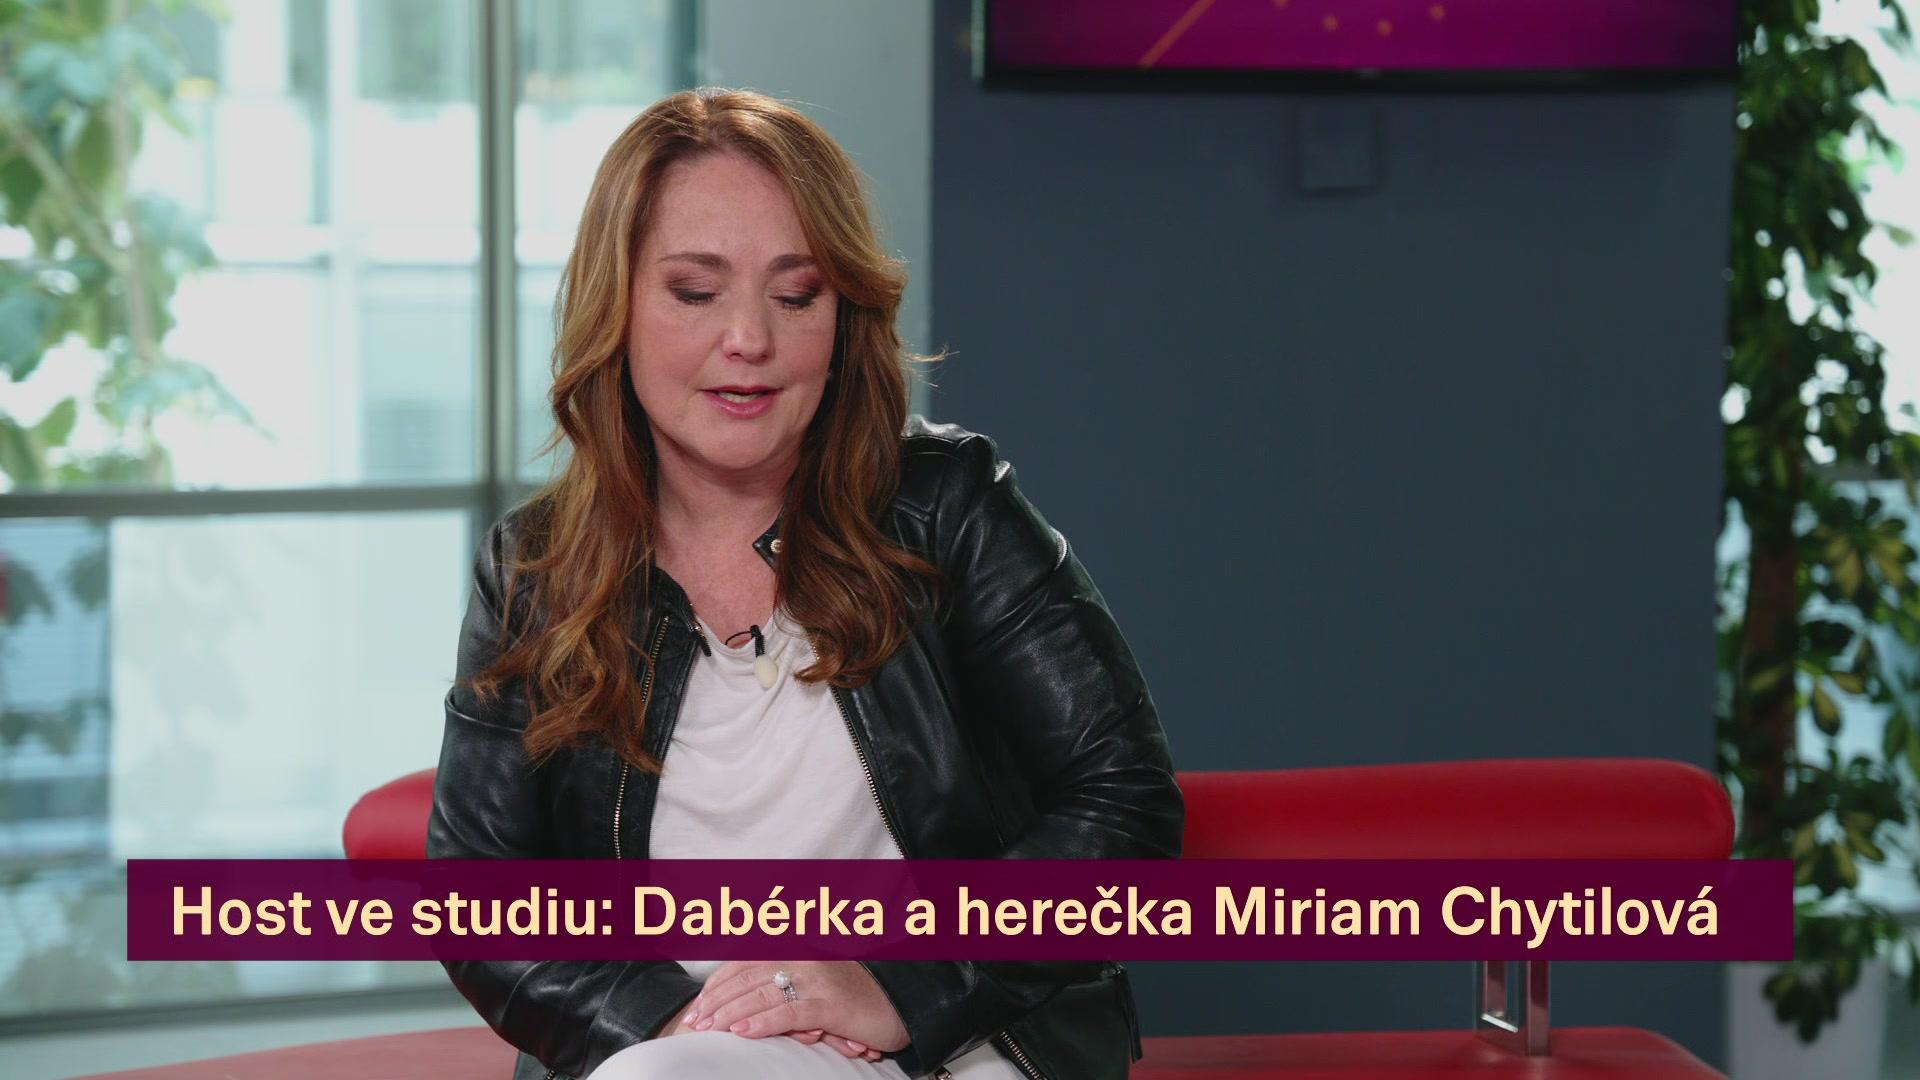 Watch Miriam Chytilova video